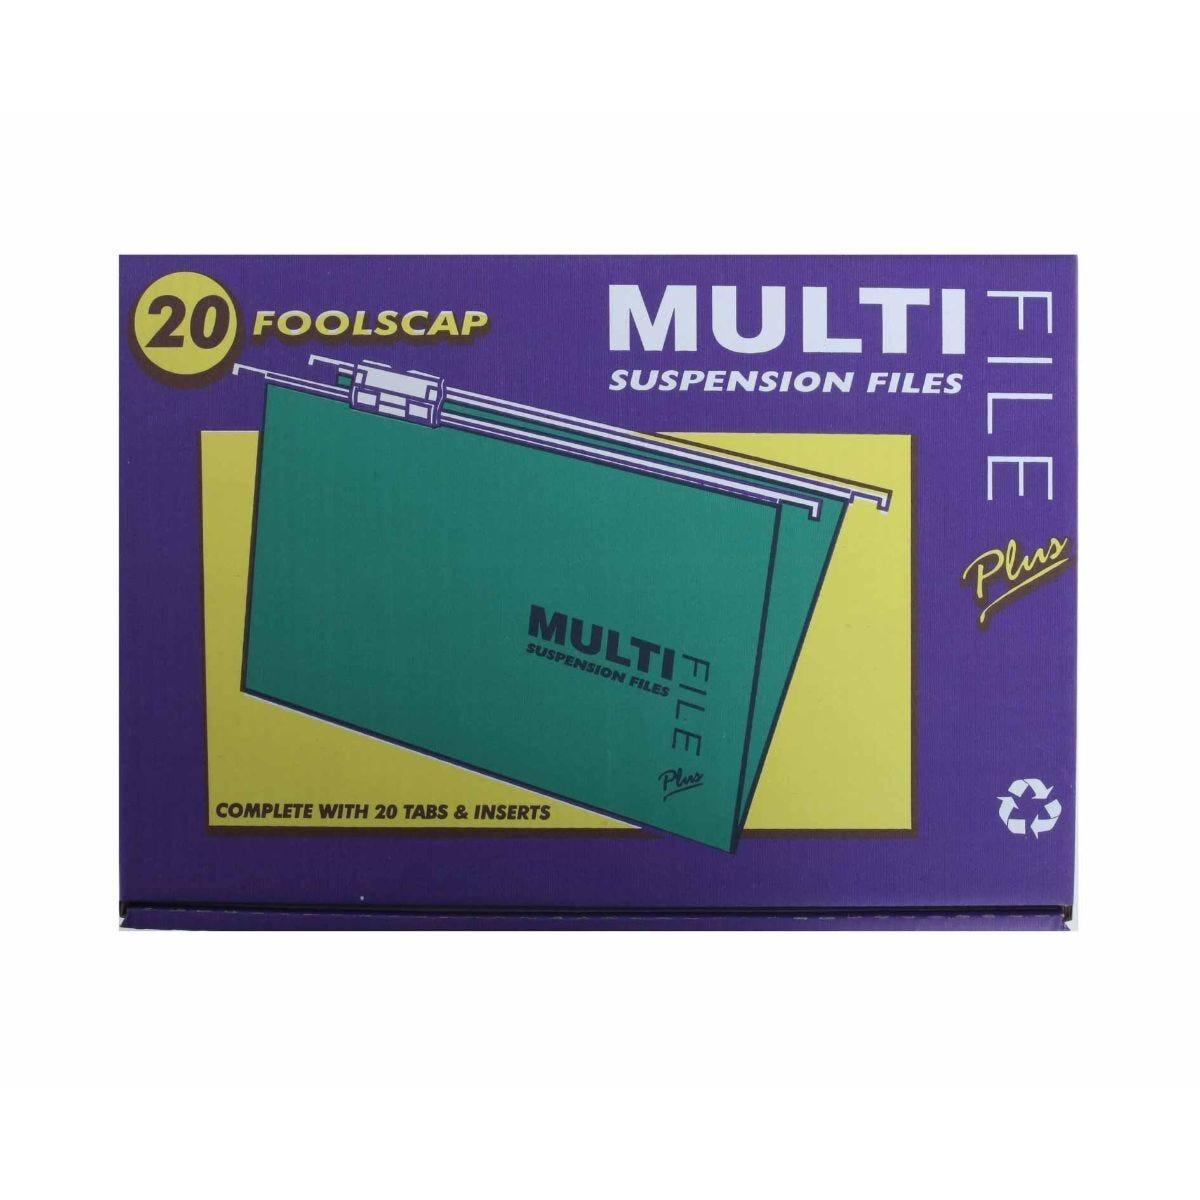 Multifile Suspension Foolscap Box of 20